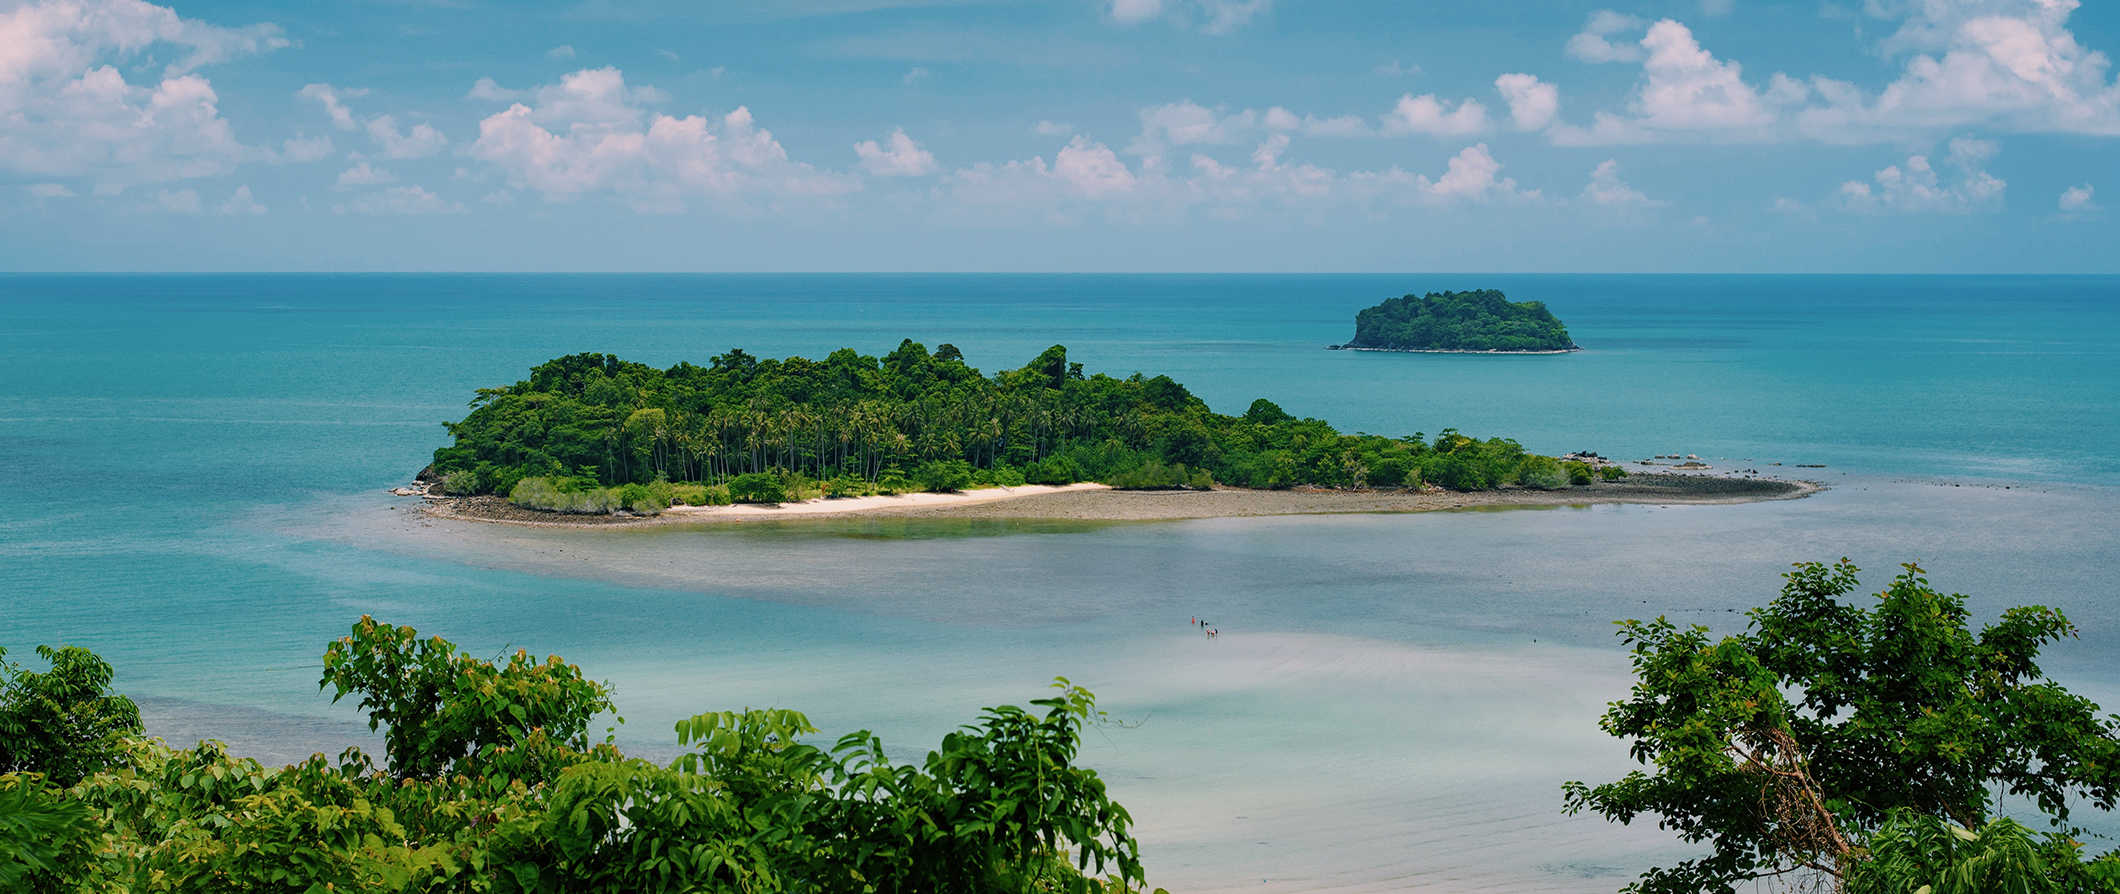 The beautiful scenery of Ko Chang, Thailand